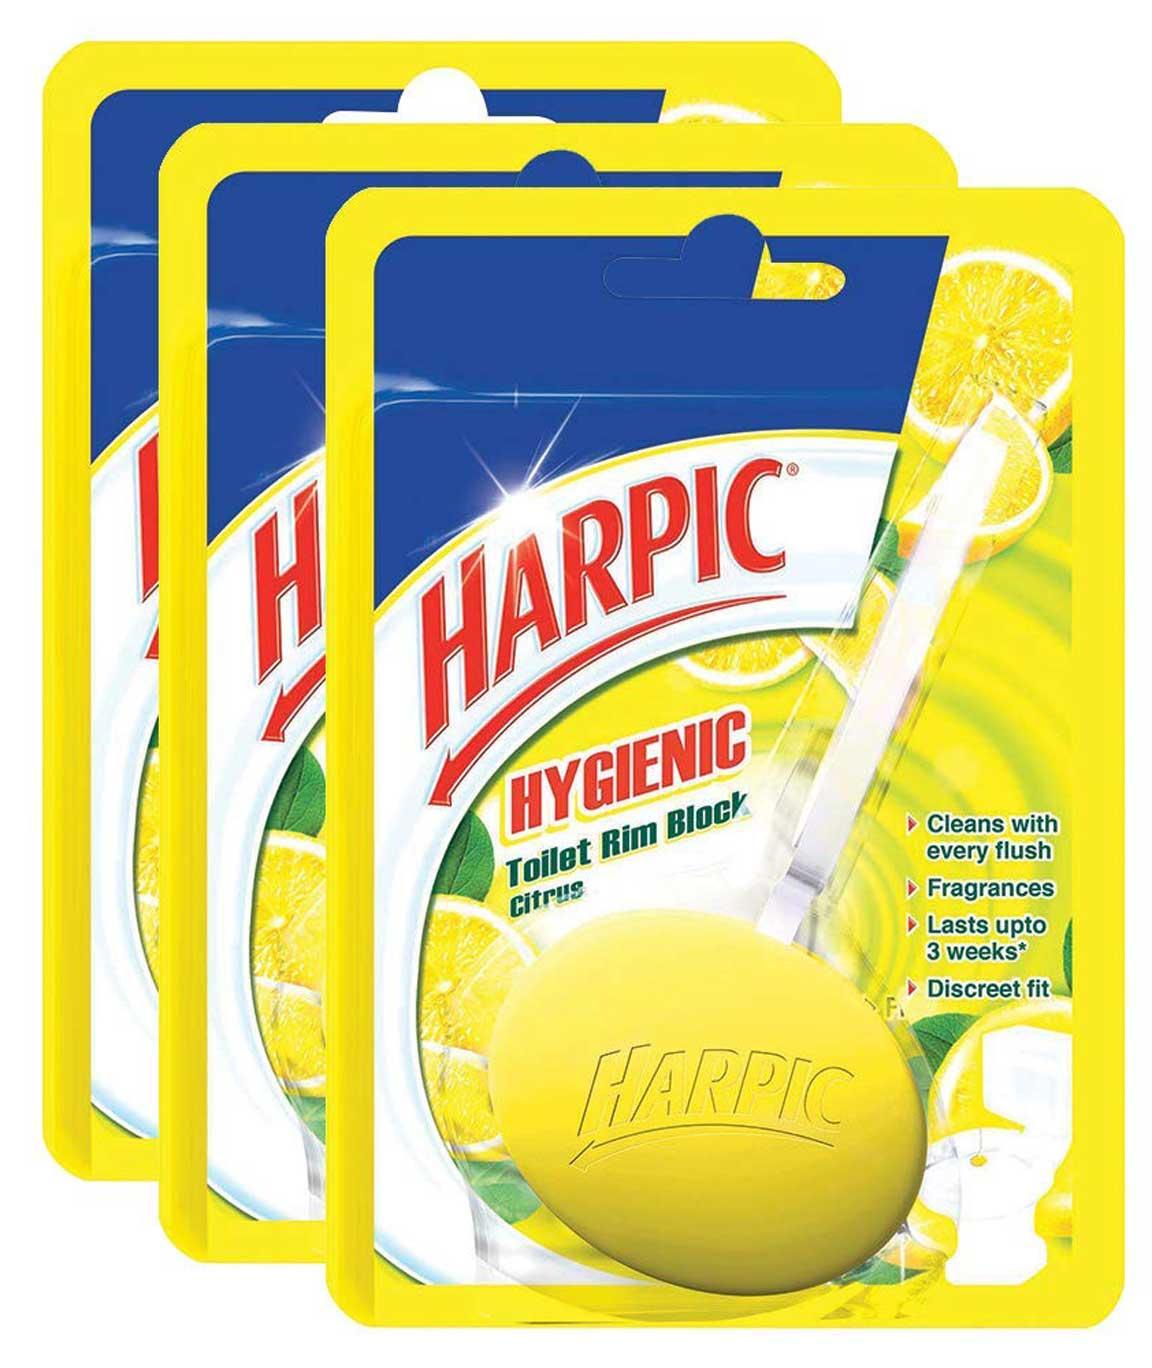 Harpic Hygiene Toilet Rim Block, Citrus - 26 g (Pack of 3)